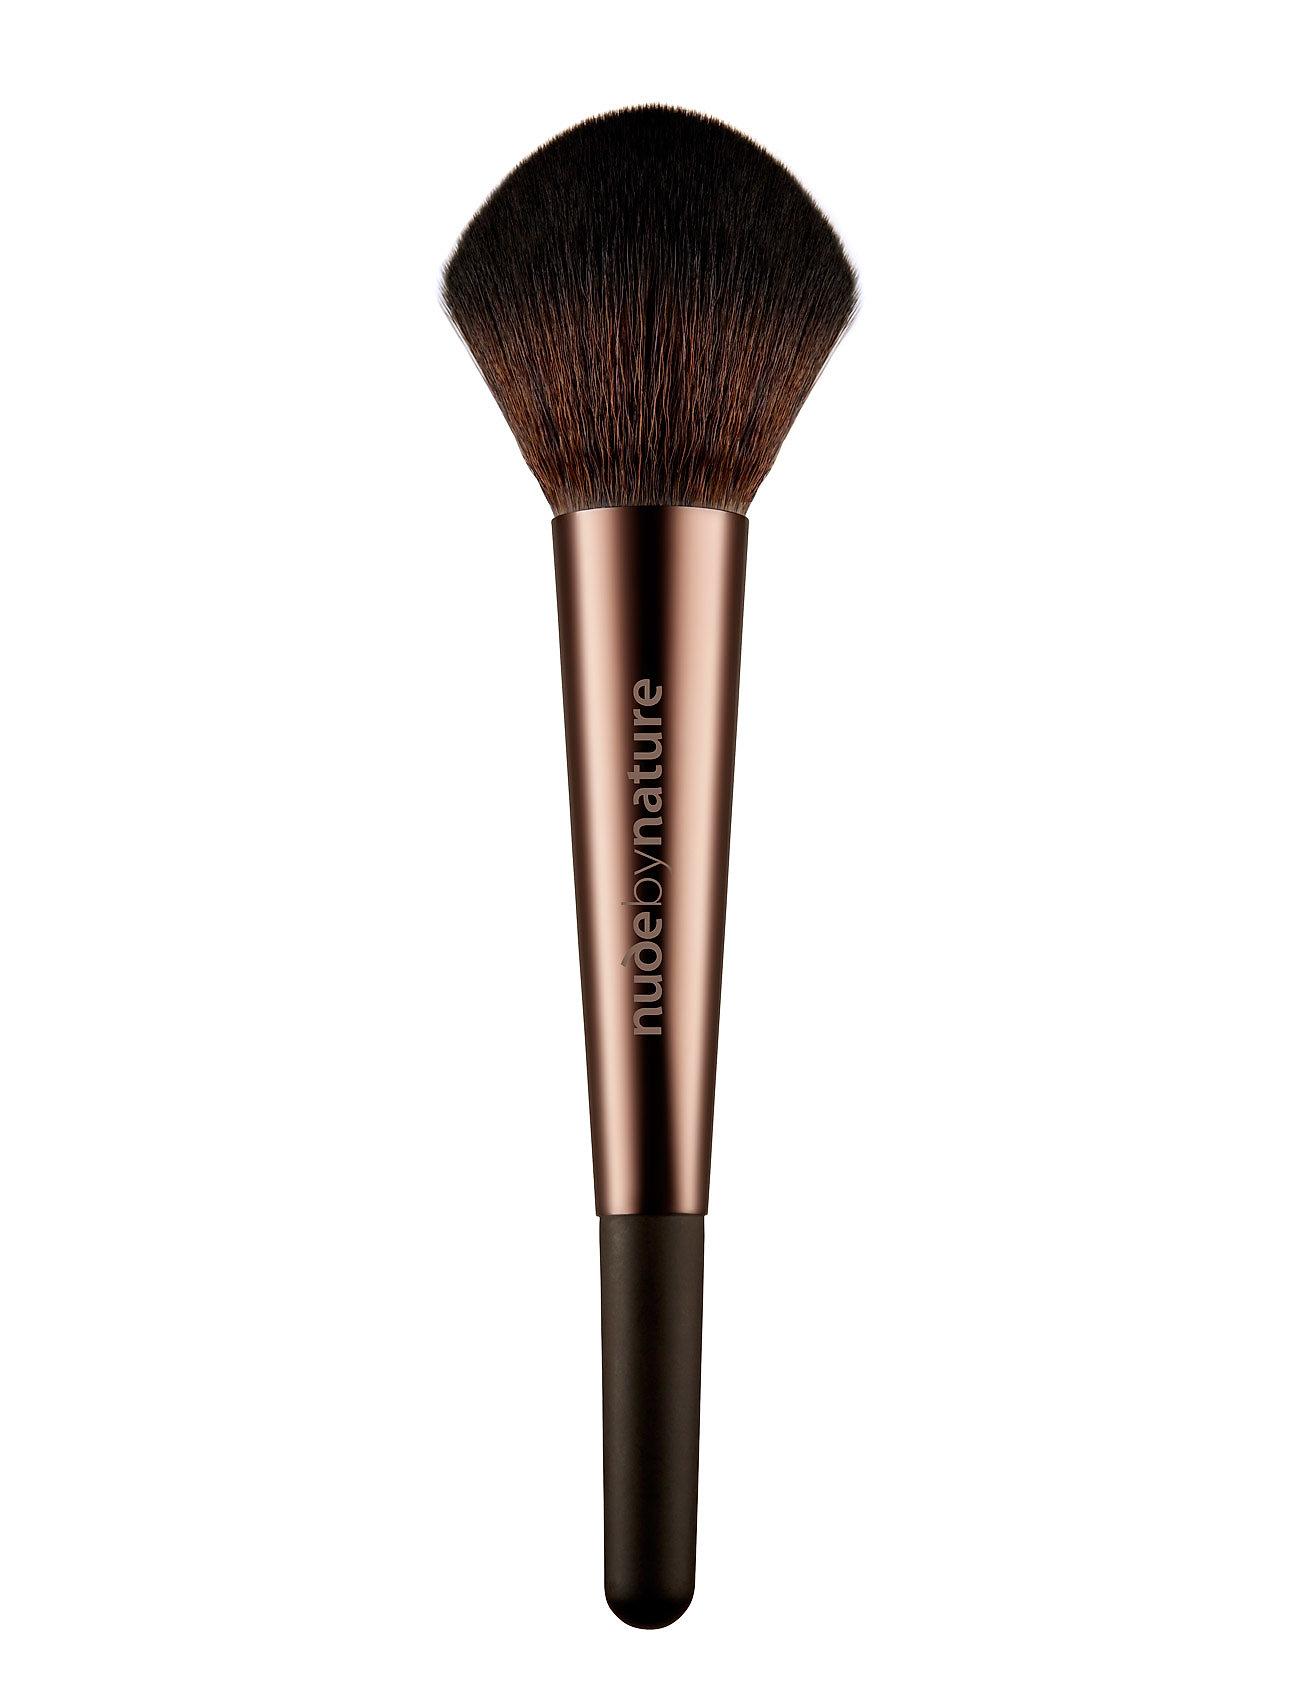 Image of Brushes 05 Finishingbrush Ansigtsbørste Makeup Nude Nude By Nature (2778815201)